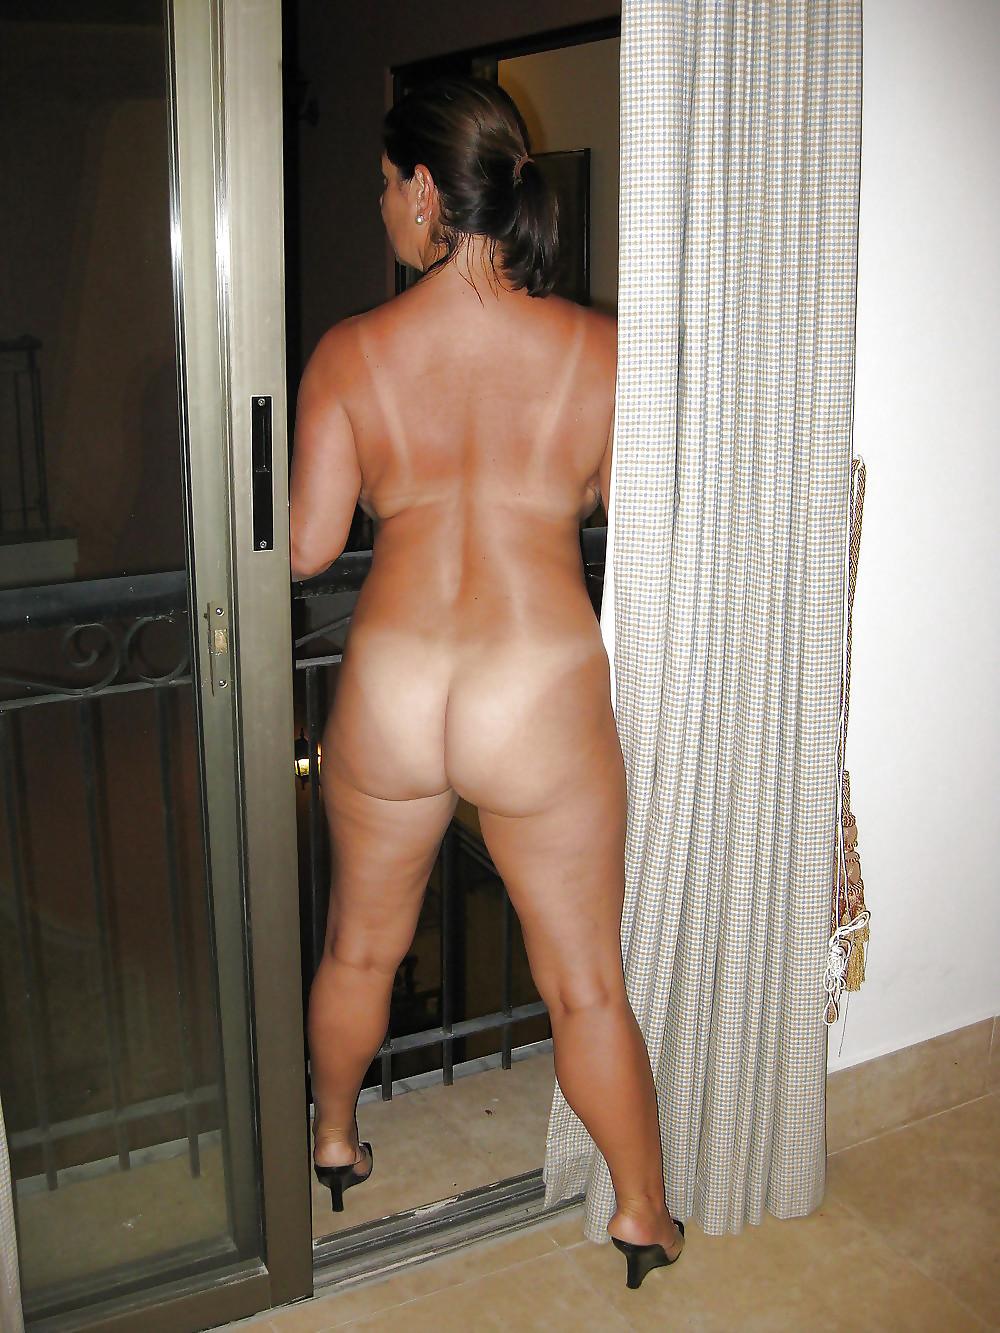 araujo-naked-big-tanned-ass-big-cock